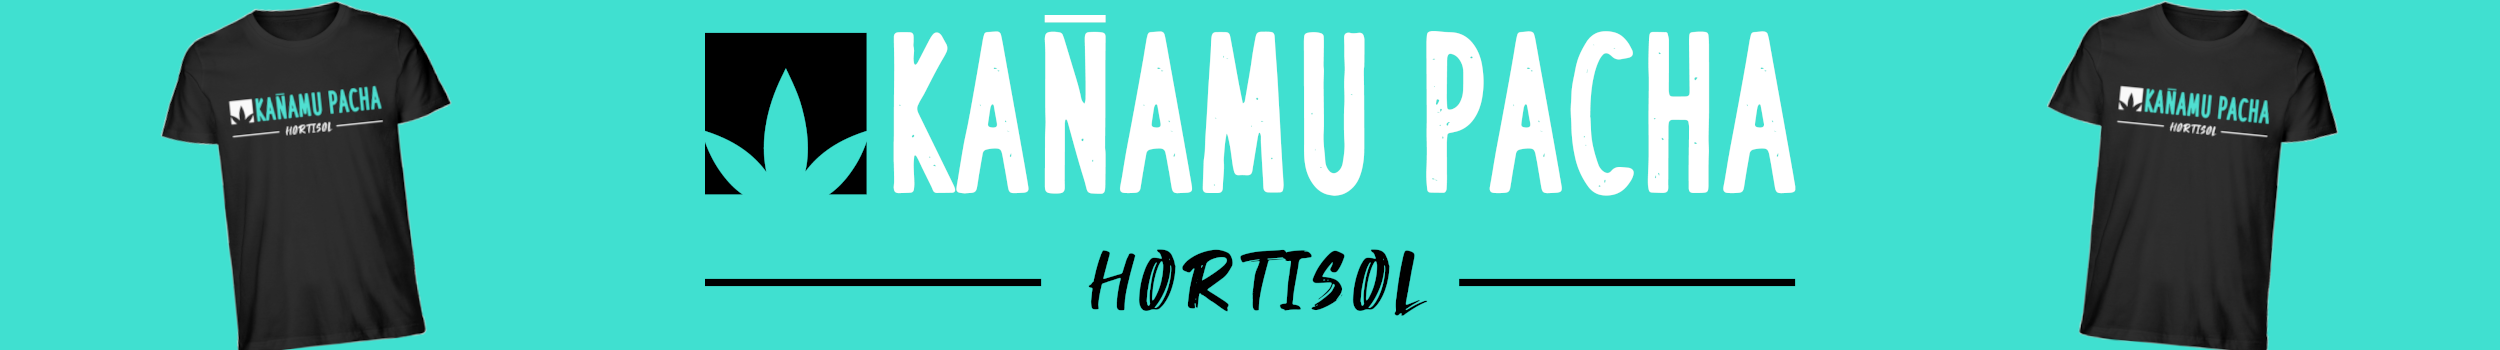 KANAMU PACHA SHIRTS AND MORE